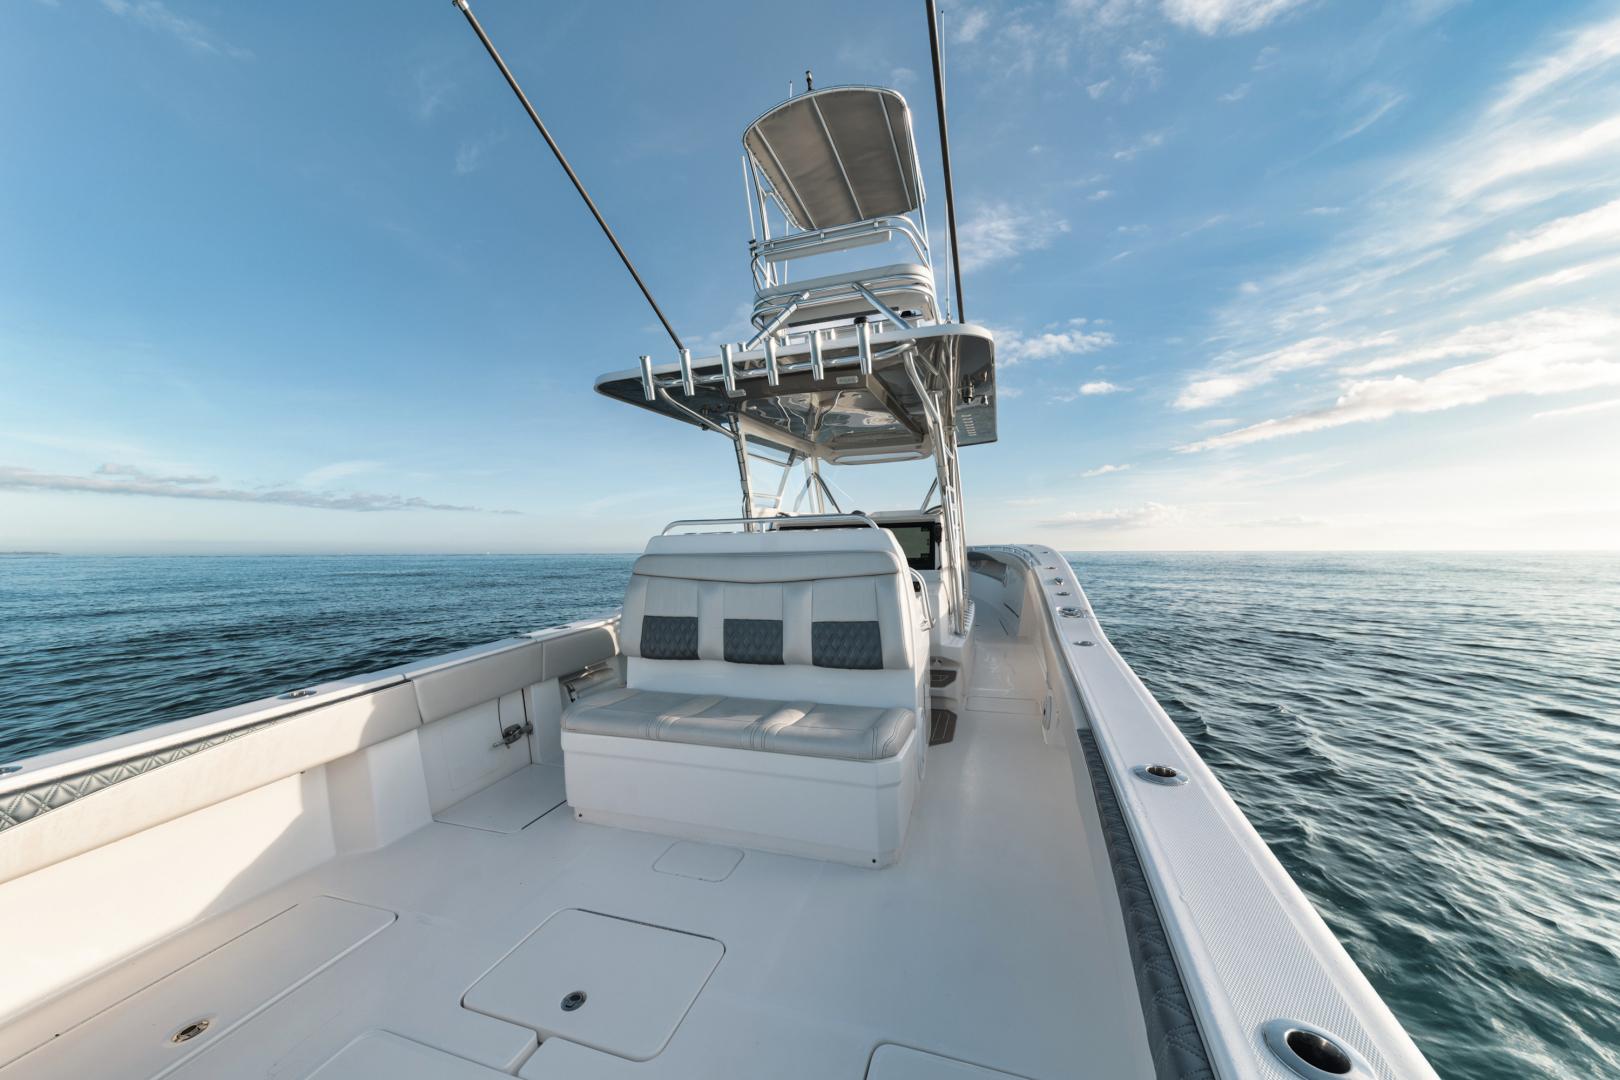 Invincible-Open Fisherman 2017-42 Invincible Jupiter-Florida-United States-1604188   Thumbnail